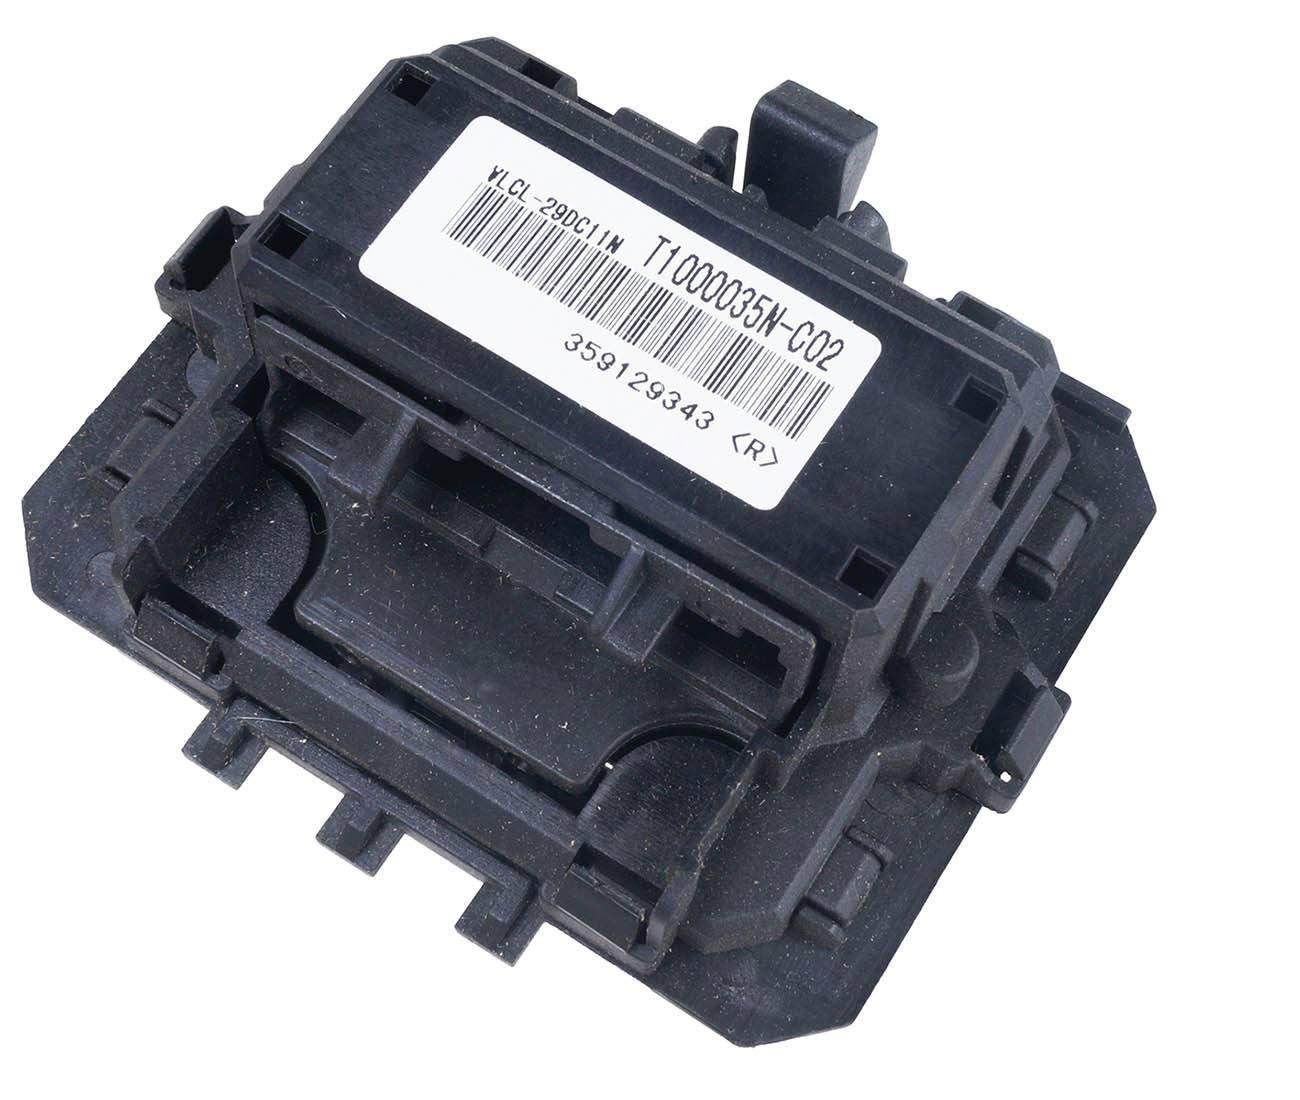 Mazda GS3M-61-B15 HVAC Blower Motor Resistor